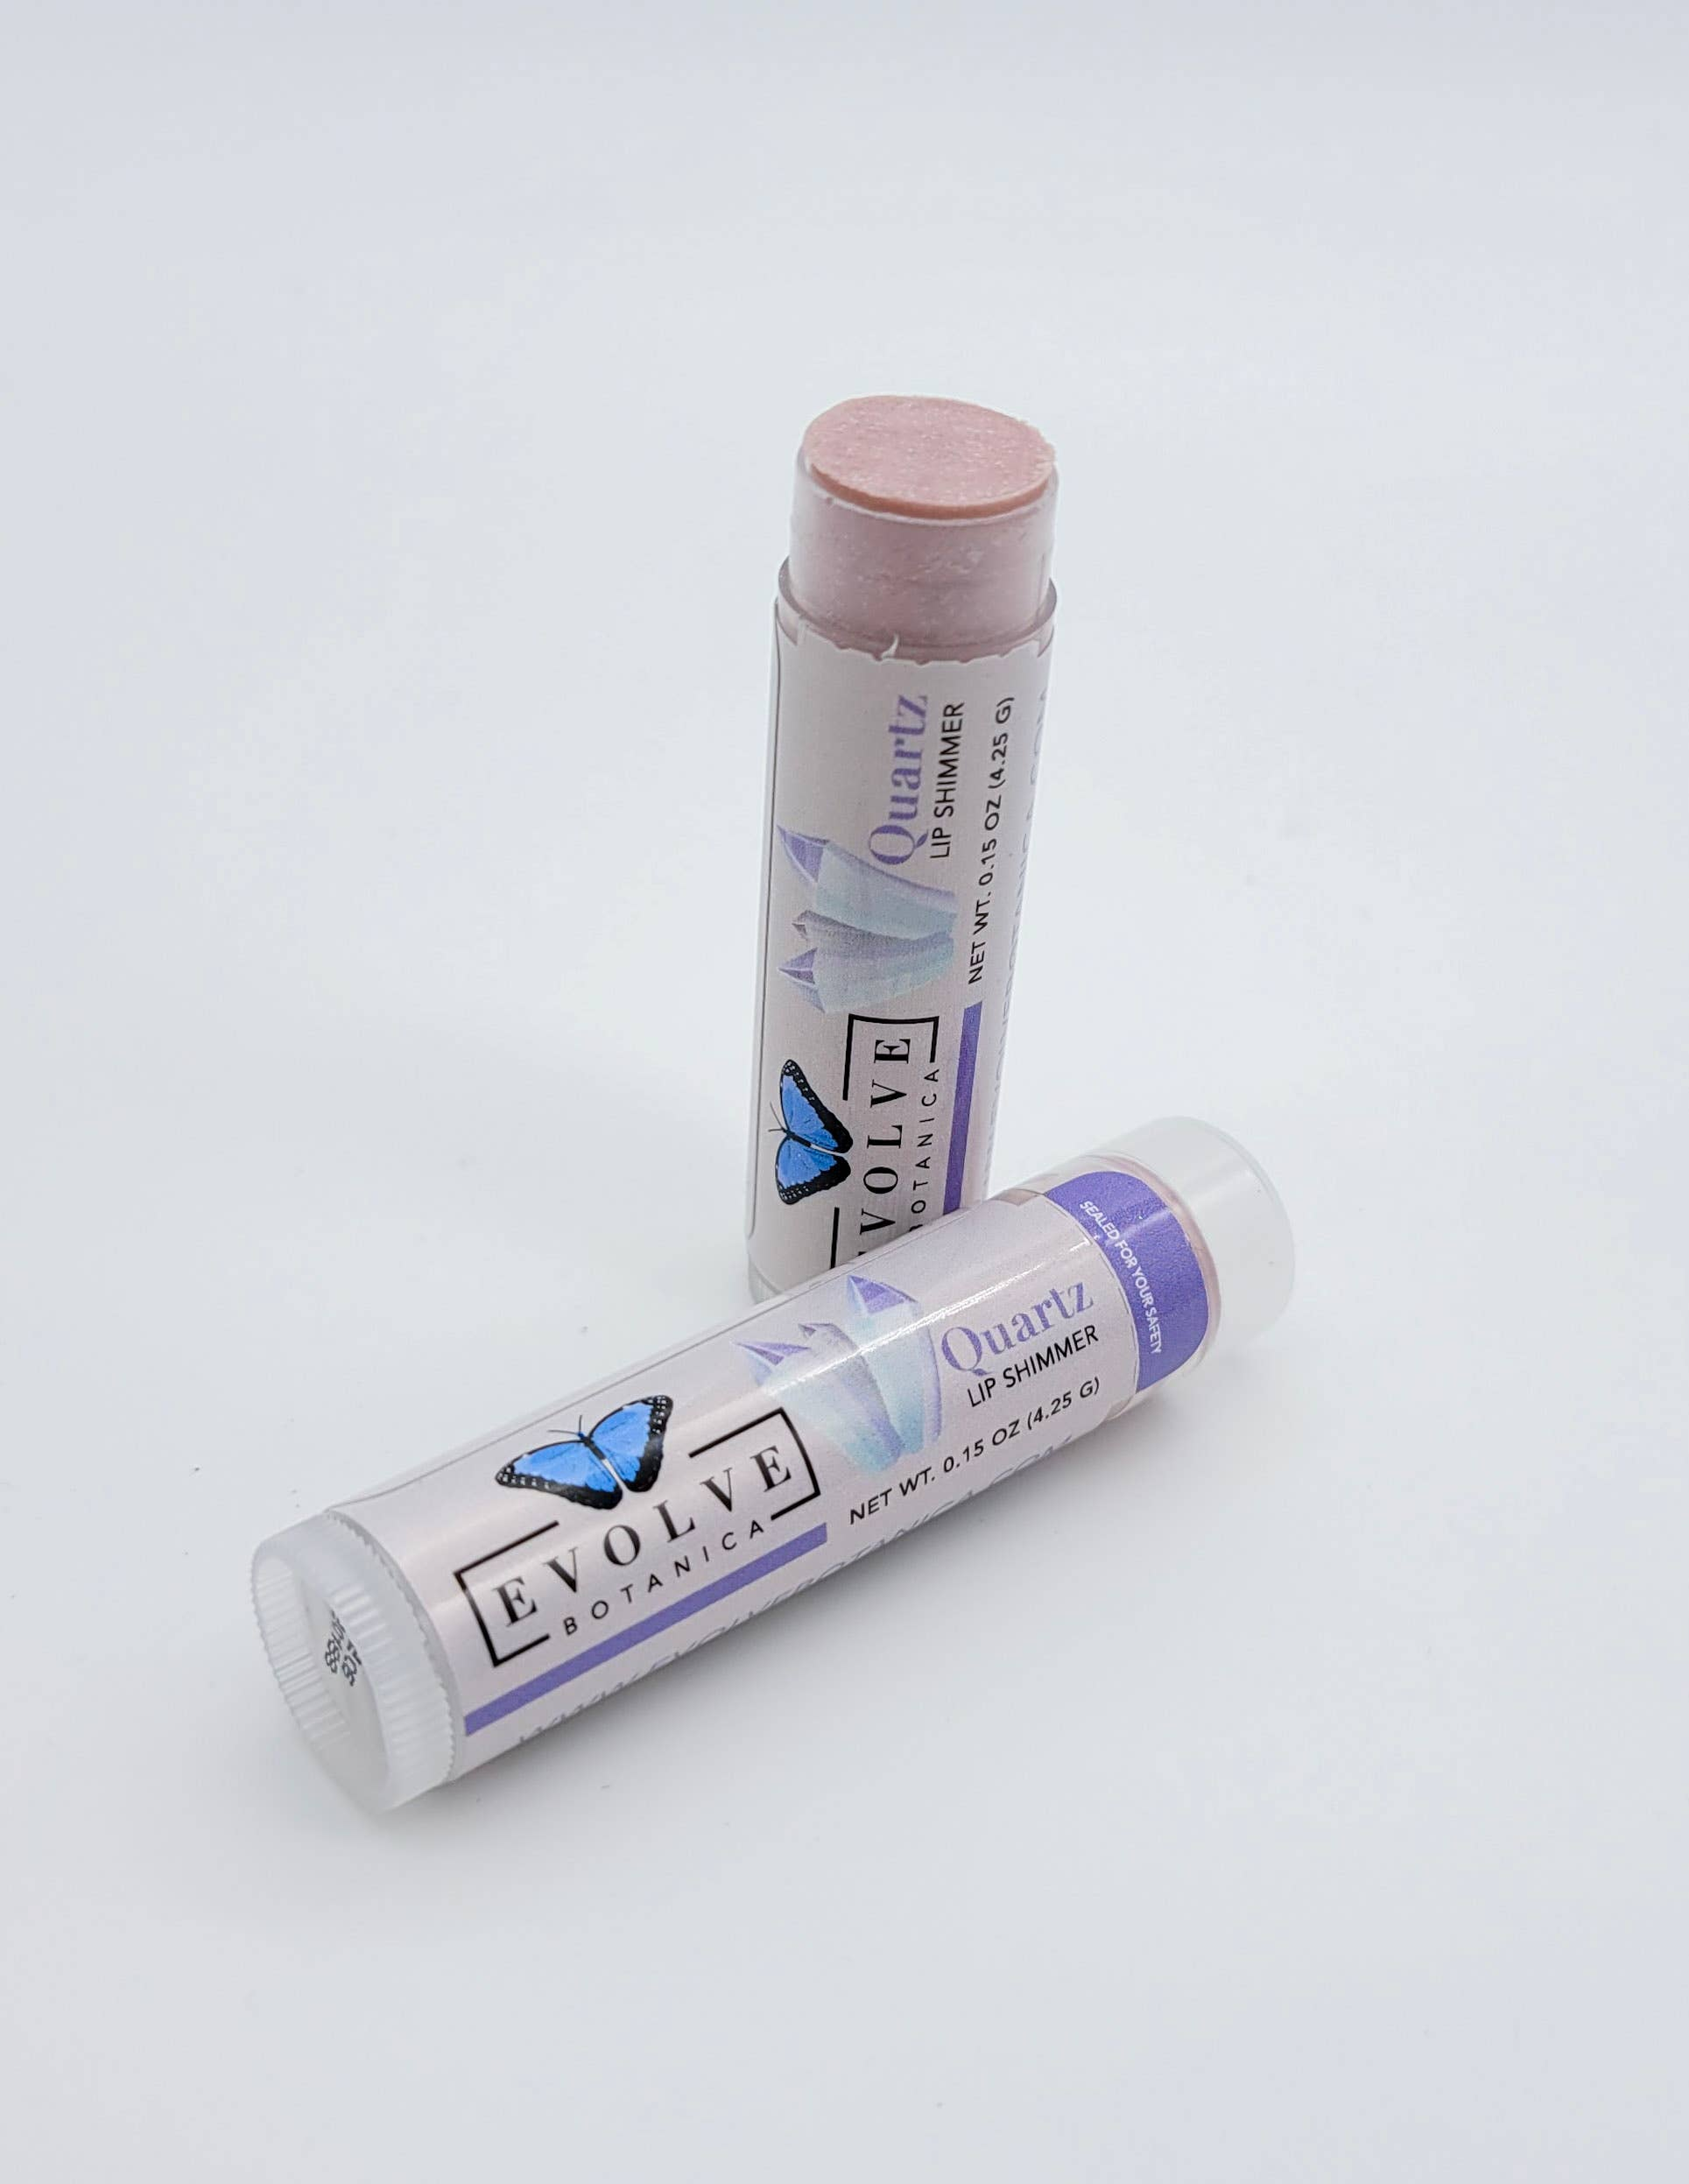 Evolve - Lip Balm - Natural Shimmer Tint - Quartz | Trada Marketplace